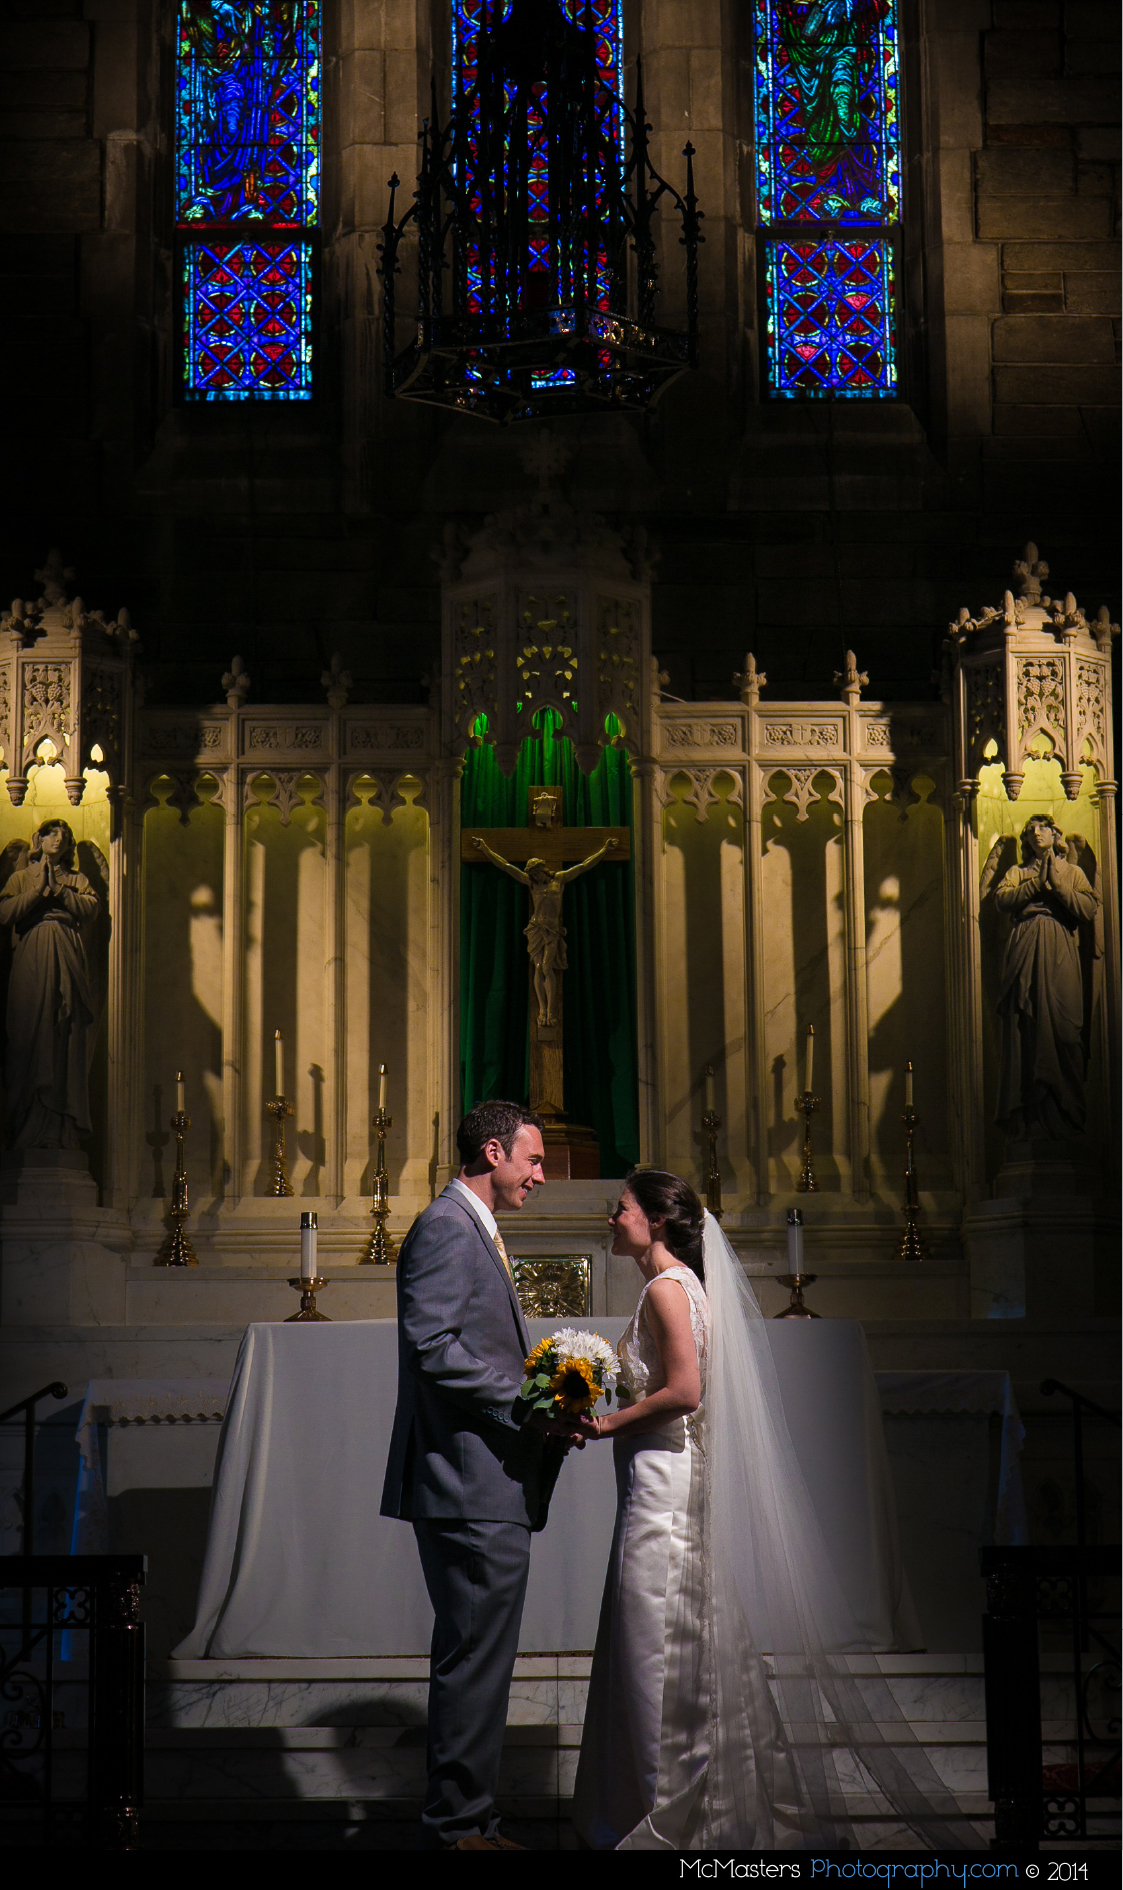 Chester County Historical Society Wedding Photos